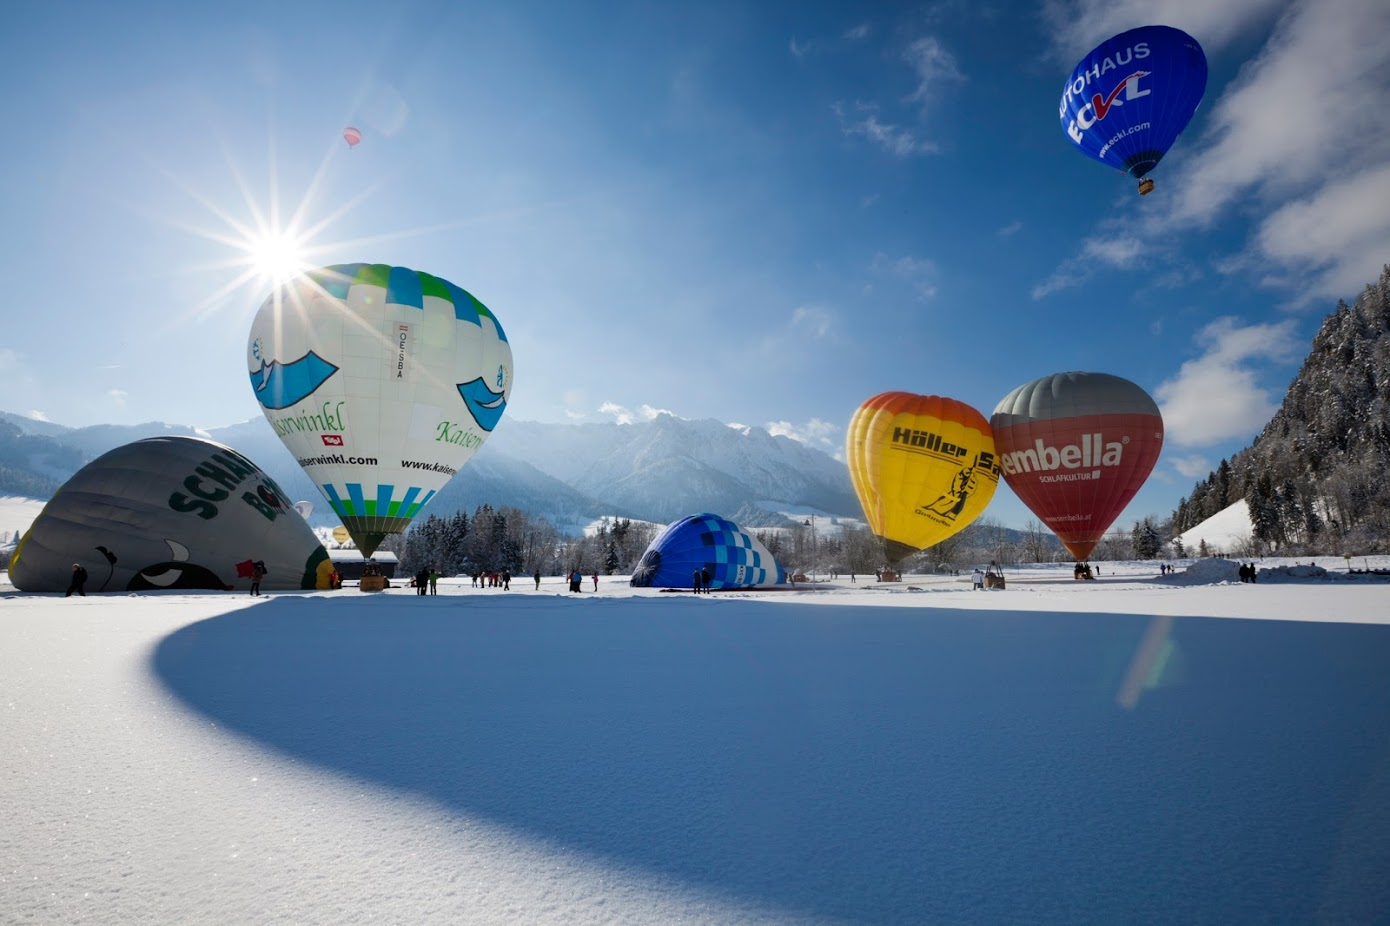 Bunte Heißluftballons, die gerade abheben